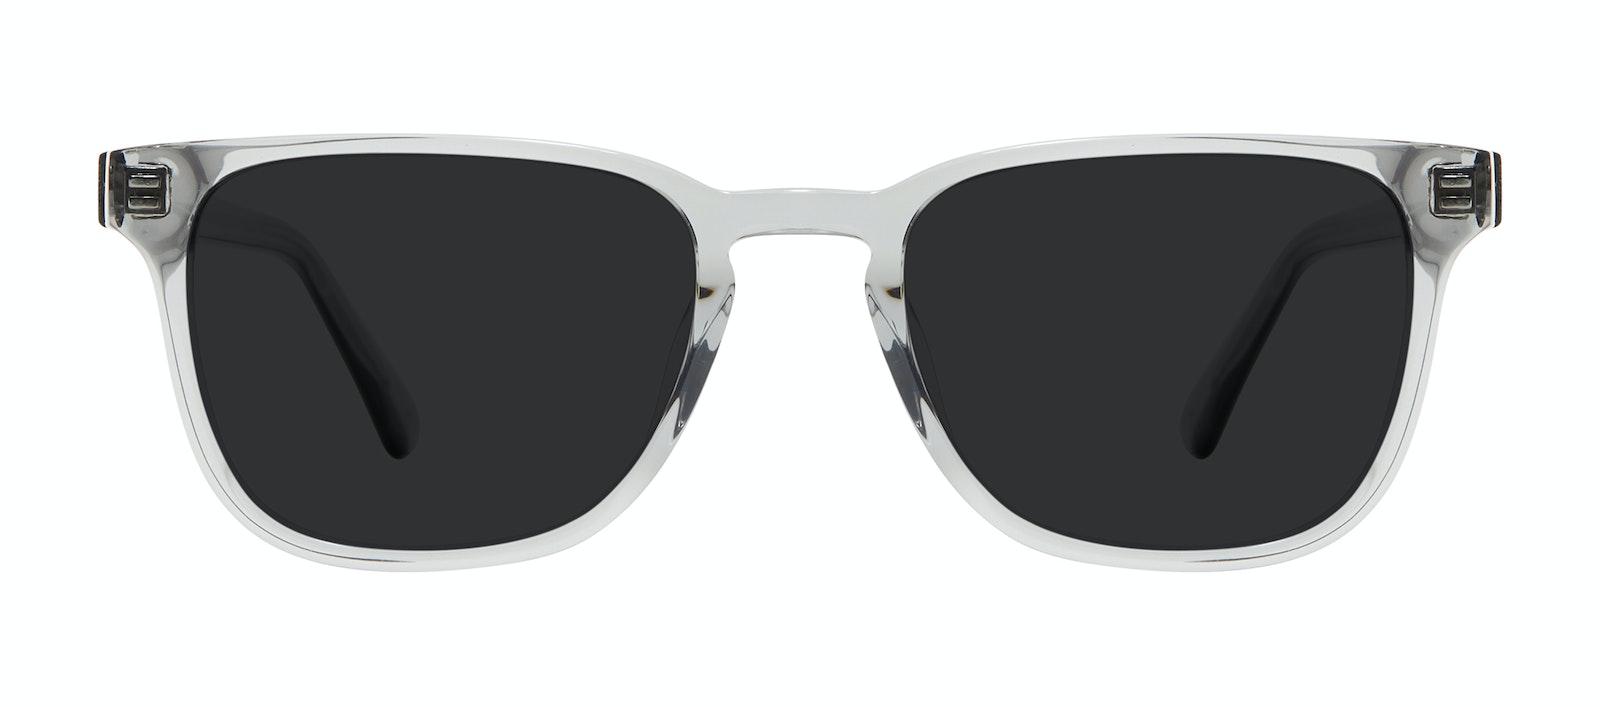 Affordable Fashion Glasses Square Sunglasses Men Kim Storm Front